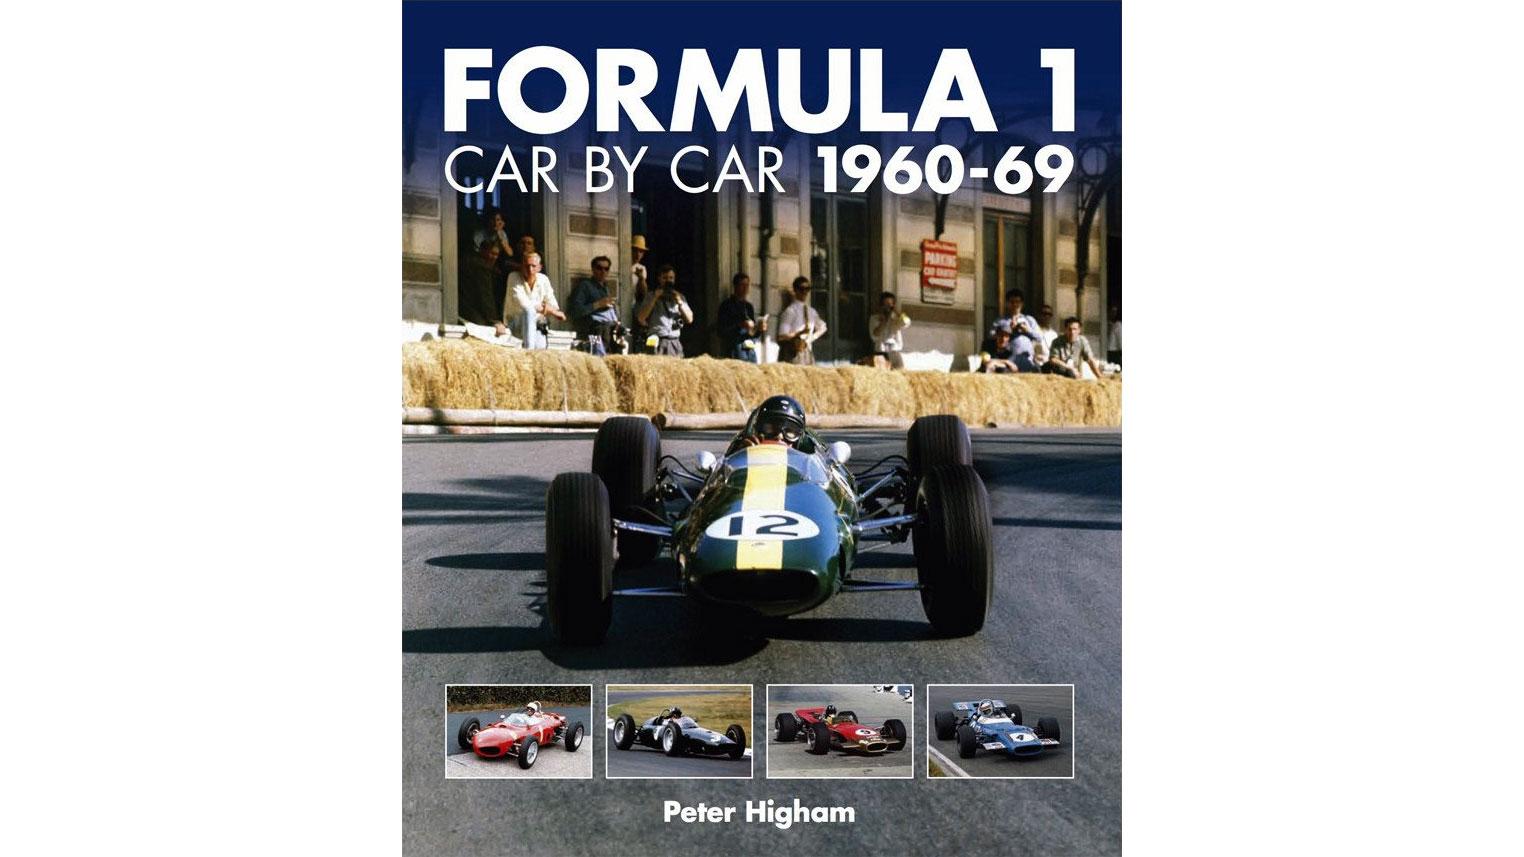 Formula 1 Car By Car 1960-69 reviewed · F1 Fanatic